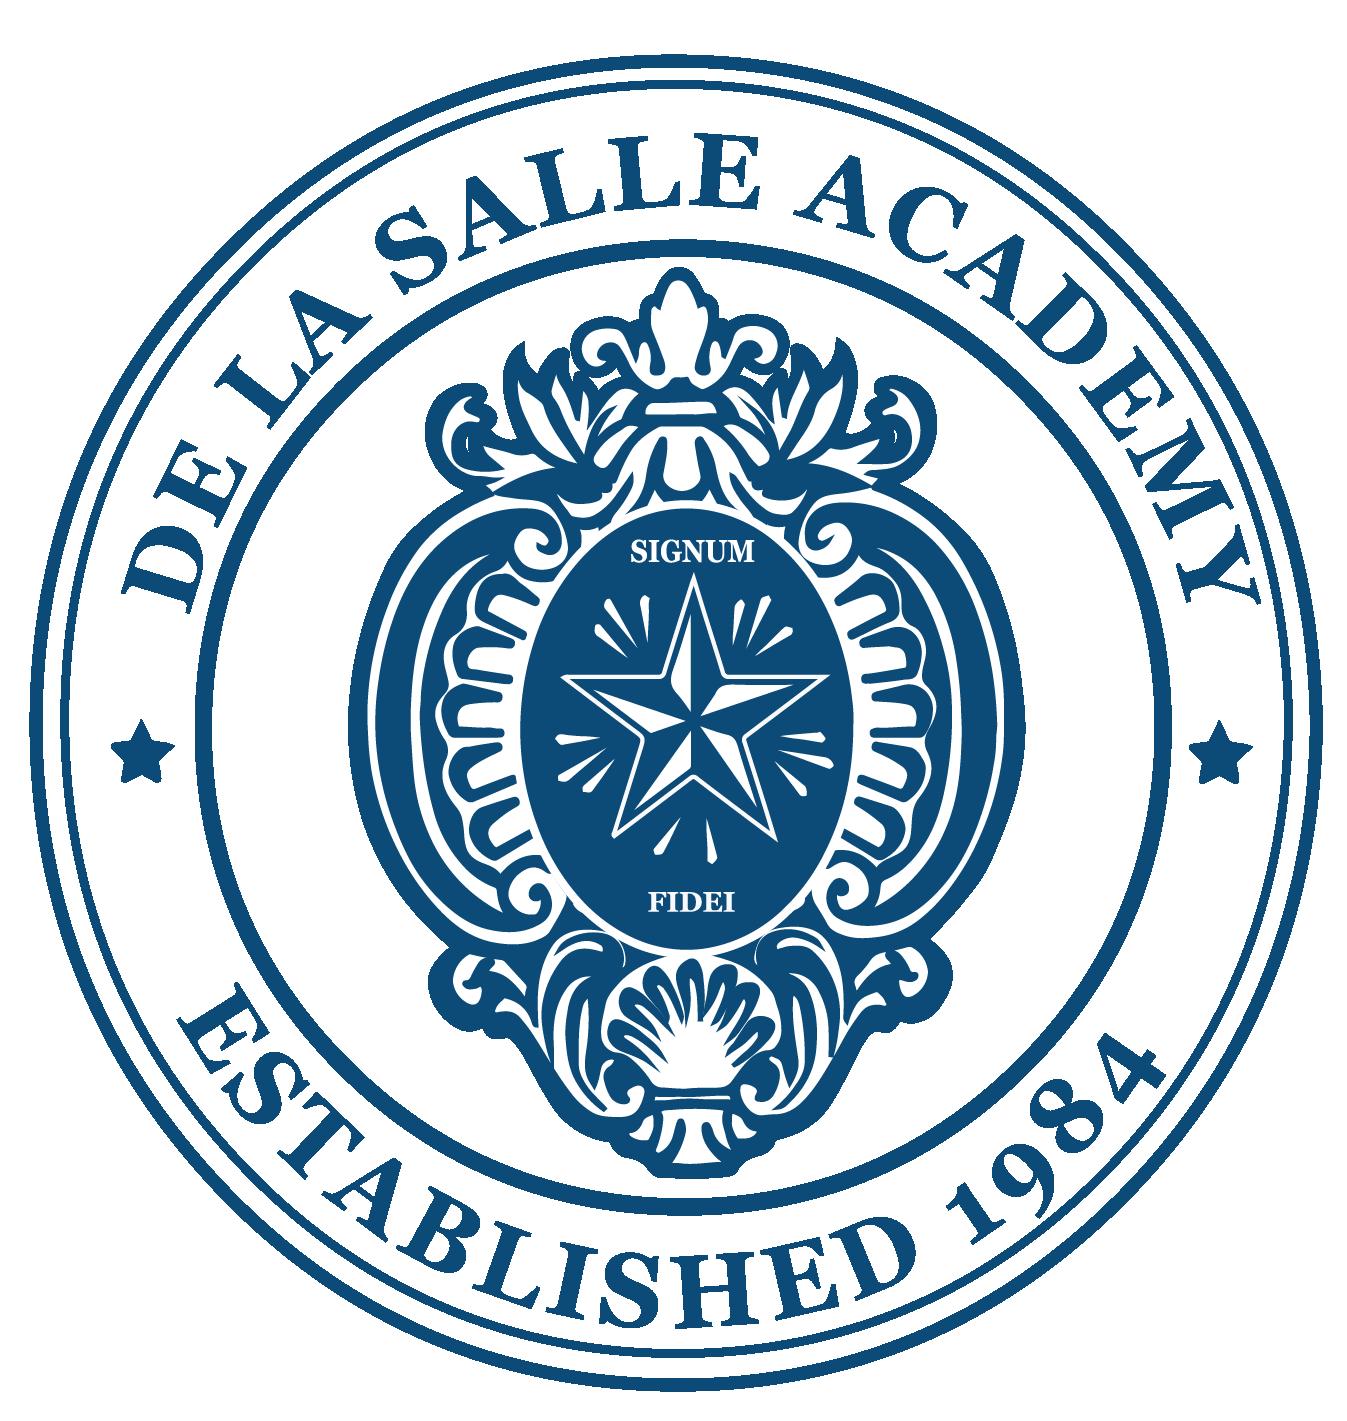 De La Salle Academy